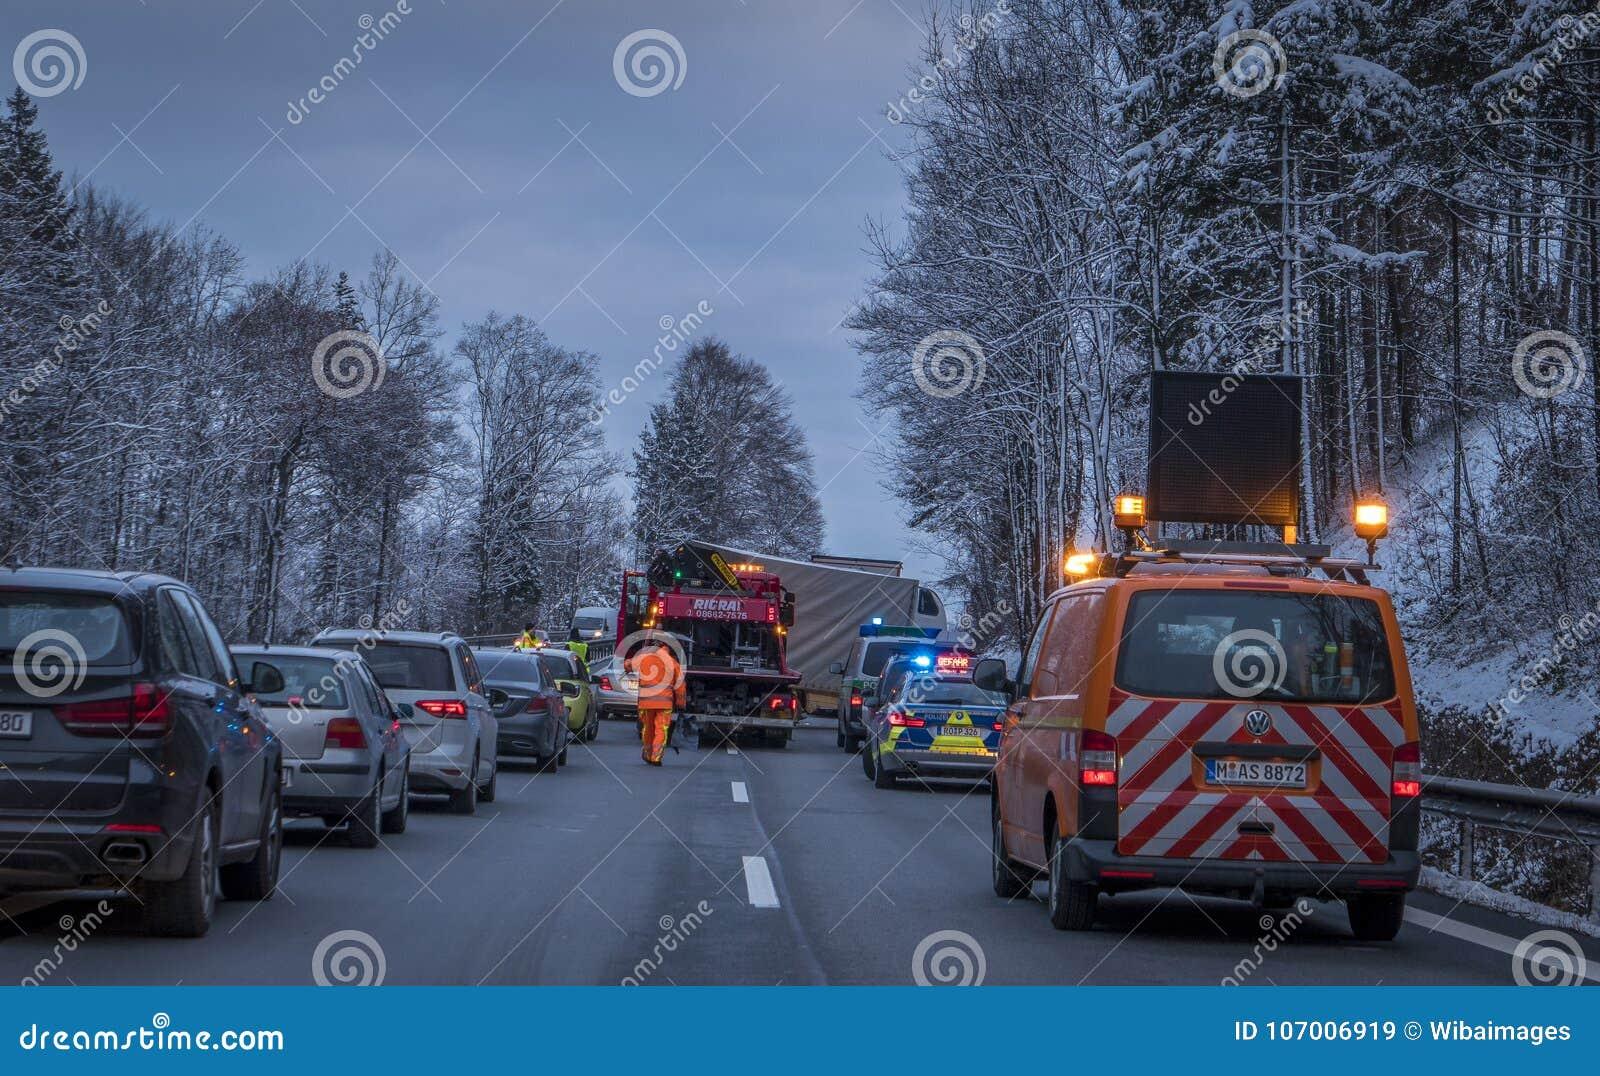 Accident On The A8 Motorway Munich-Salzburg Editorial Stock